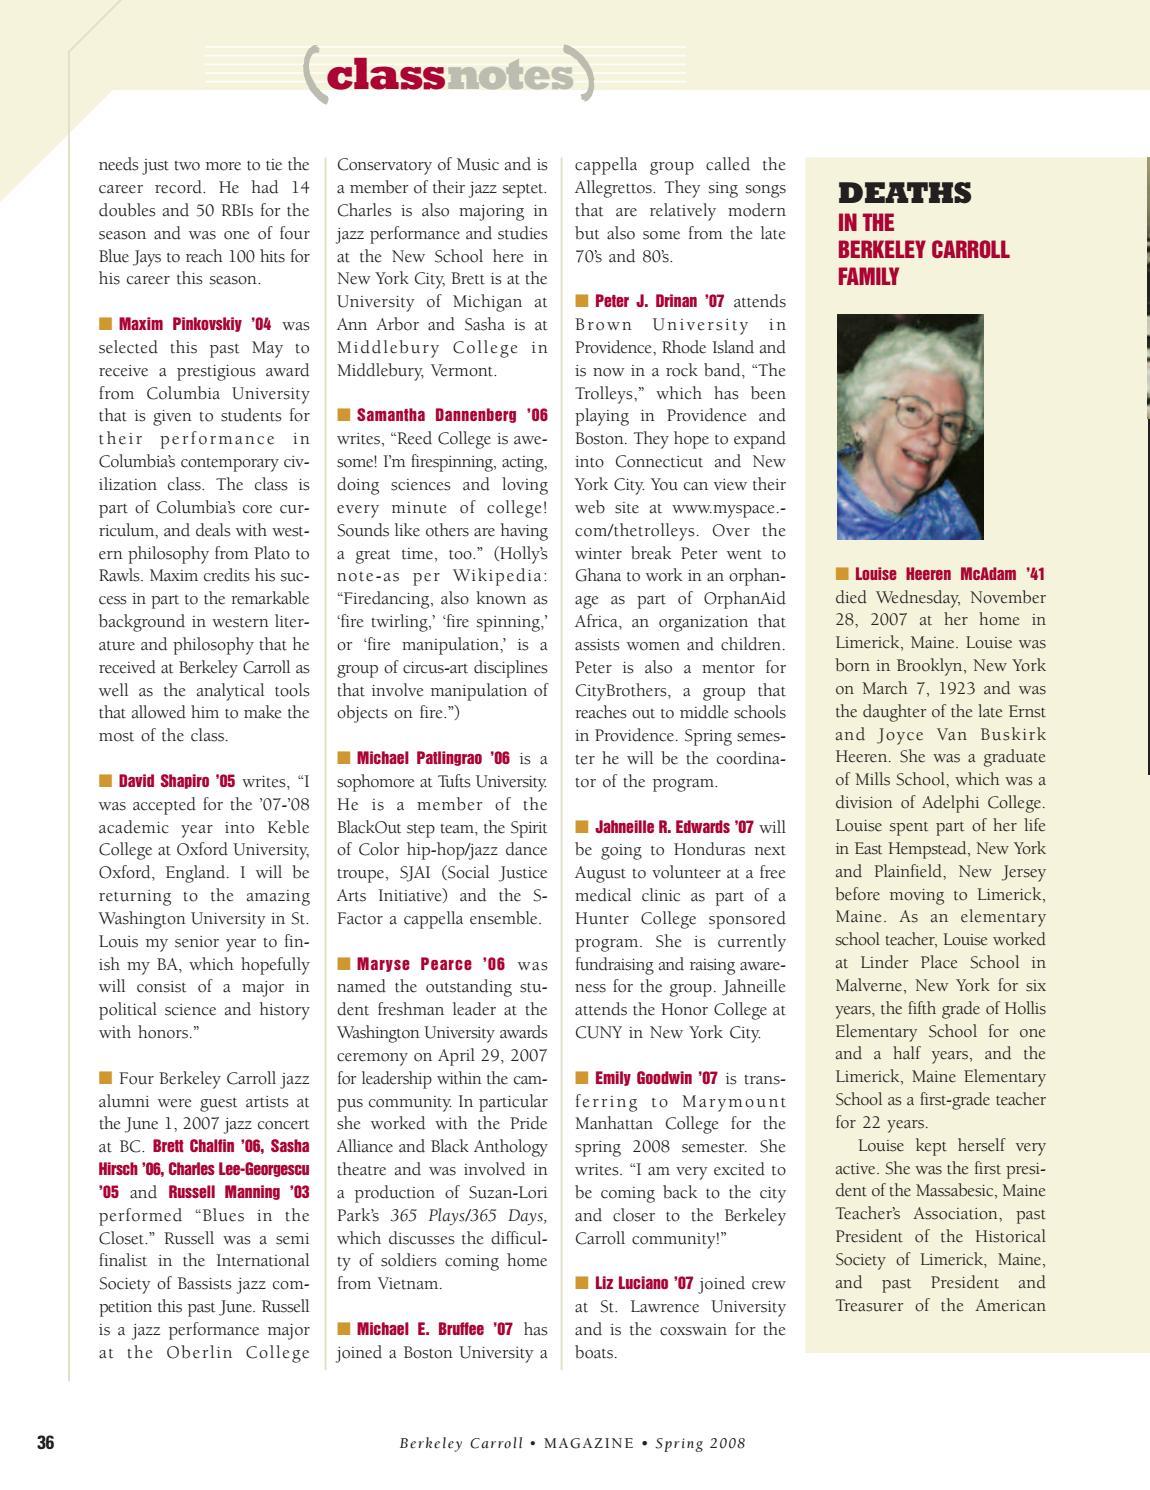 BC Magazine Spring 2008 by Berkeley Carroll - issuu